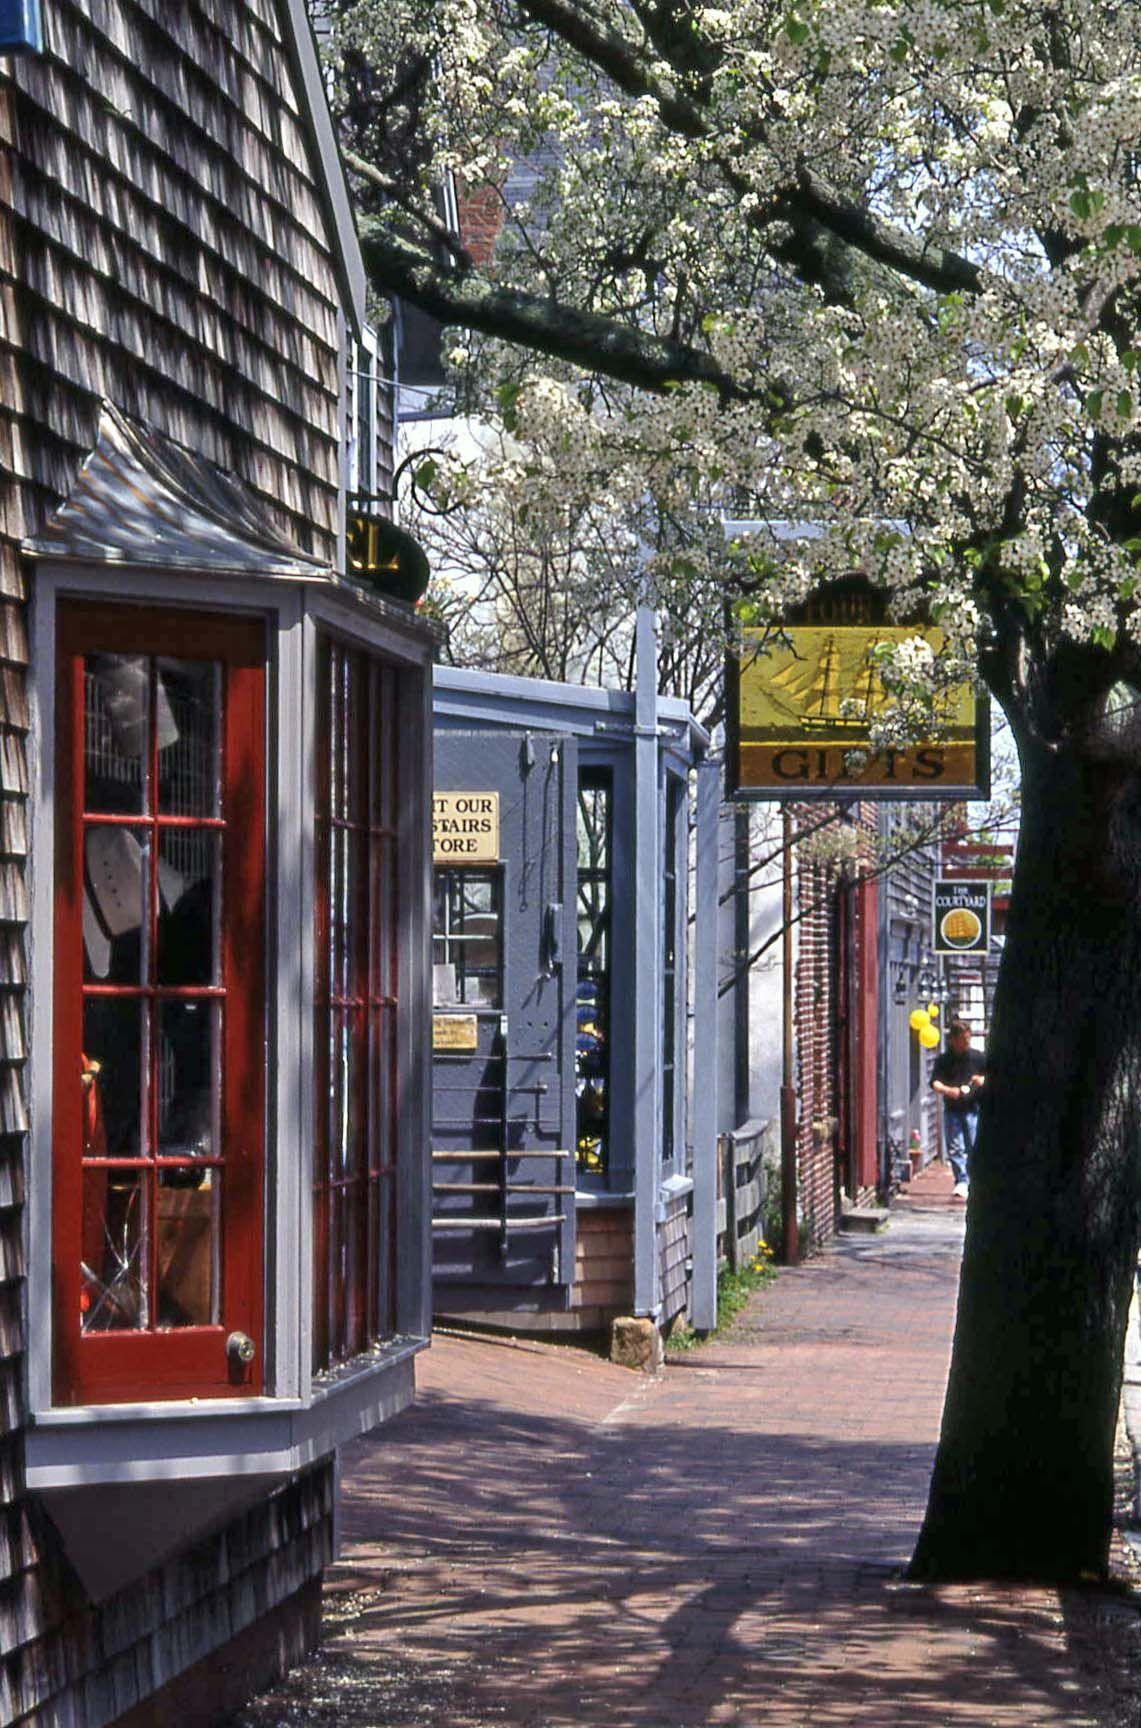 Downtown Classic Coastal Home: Nantucket, Cape Cod MA. Http://www.visitingnewengland.com